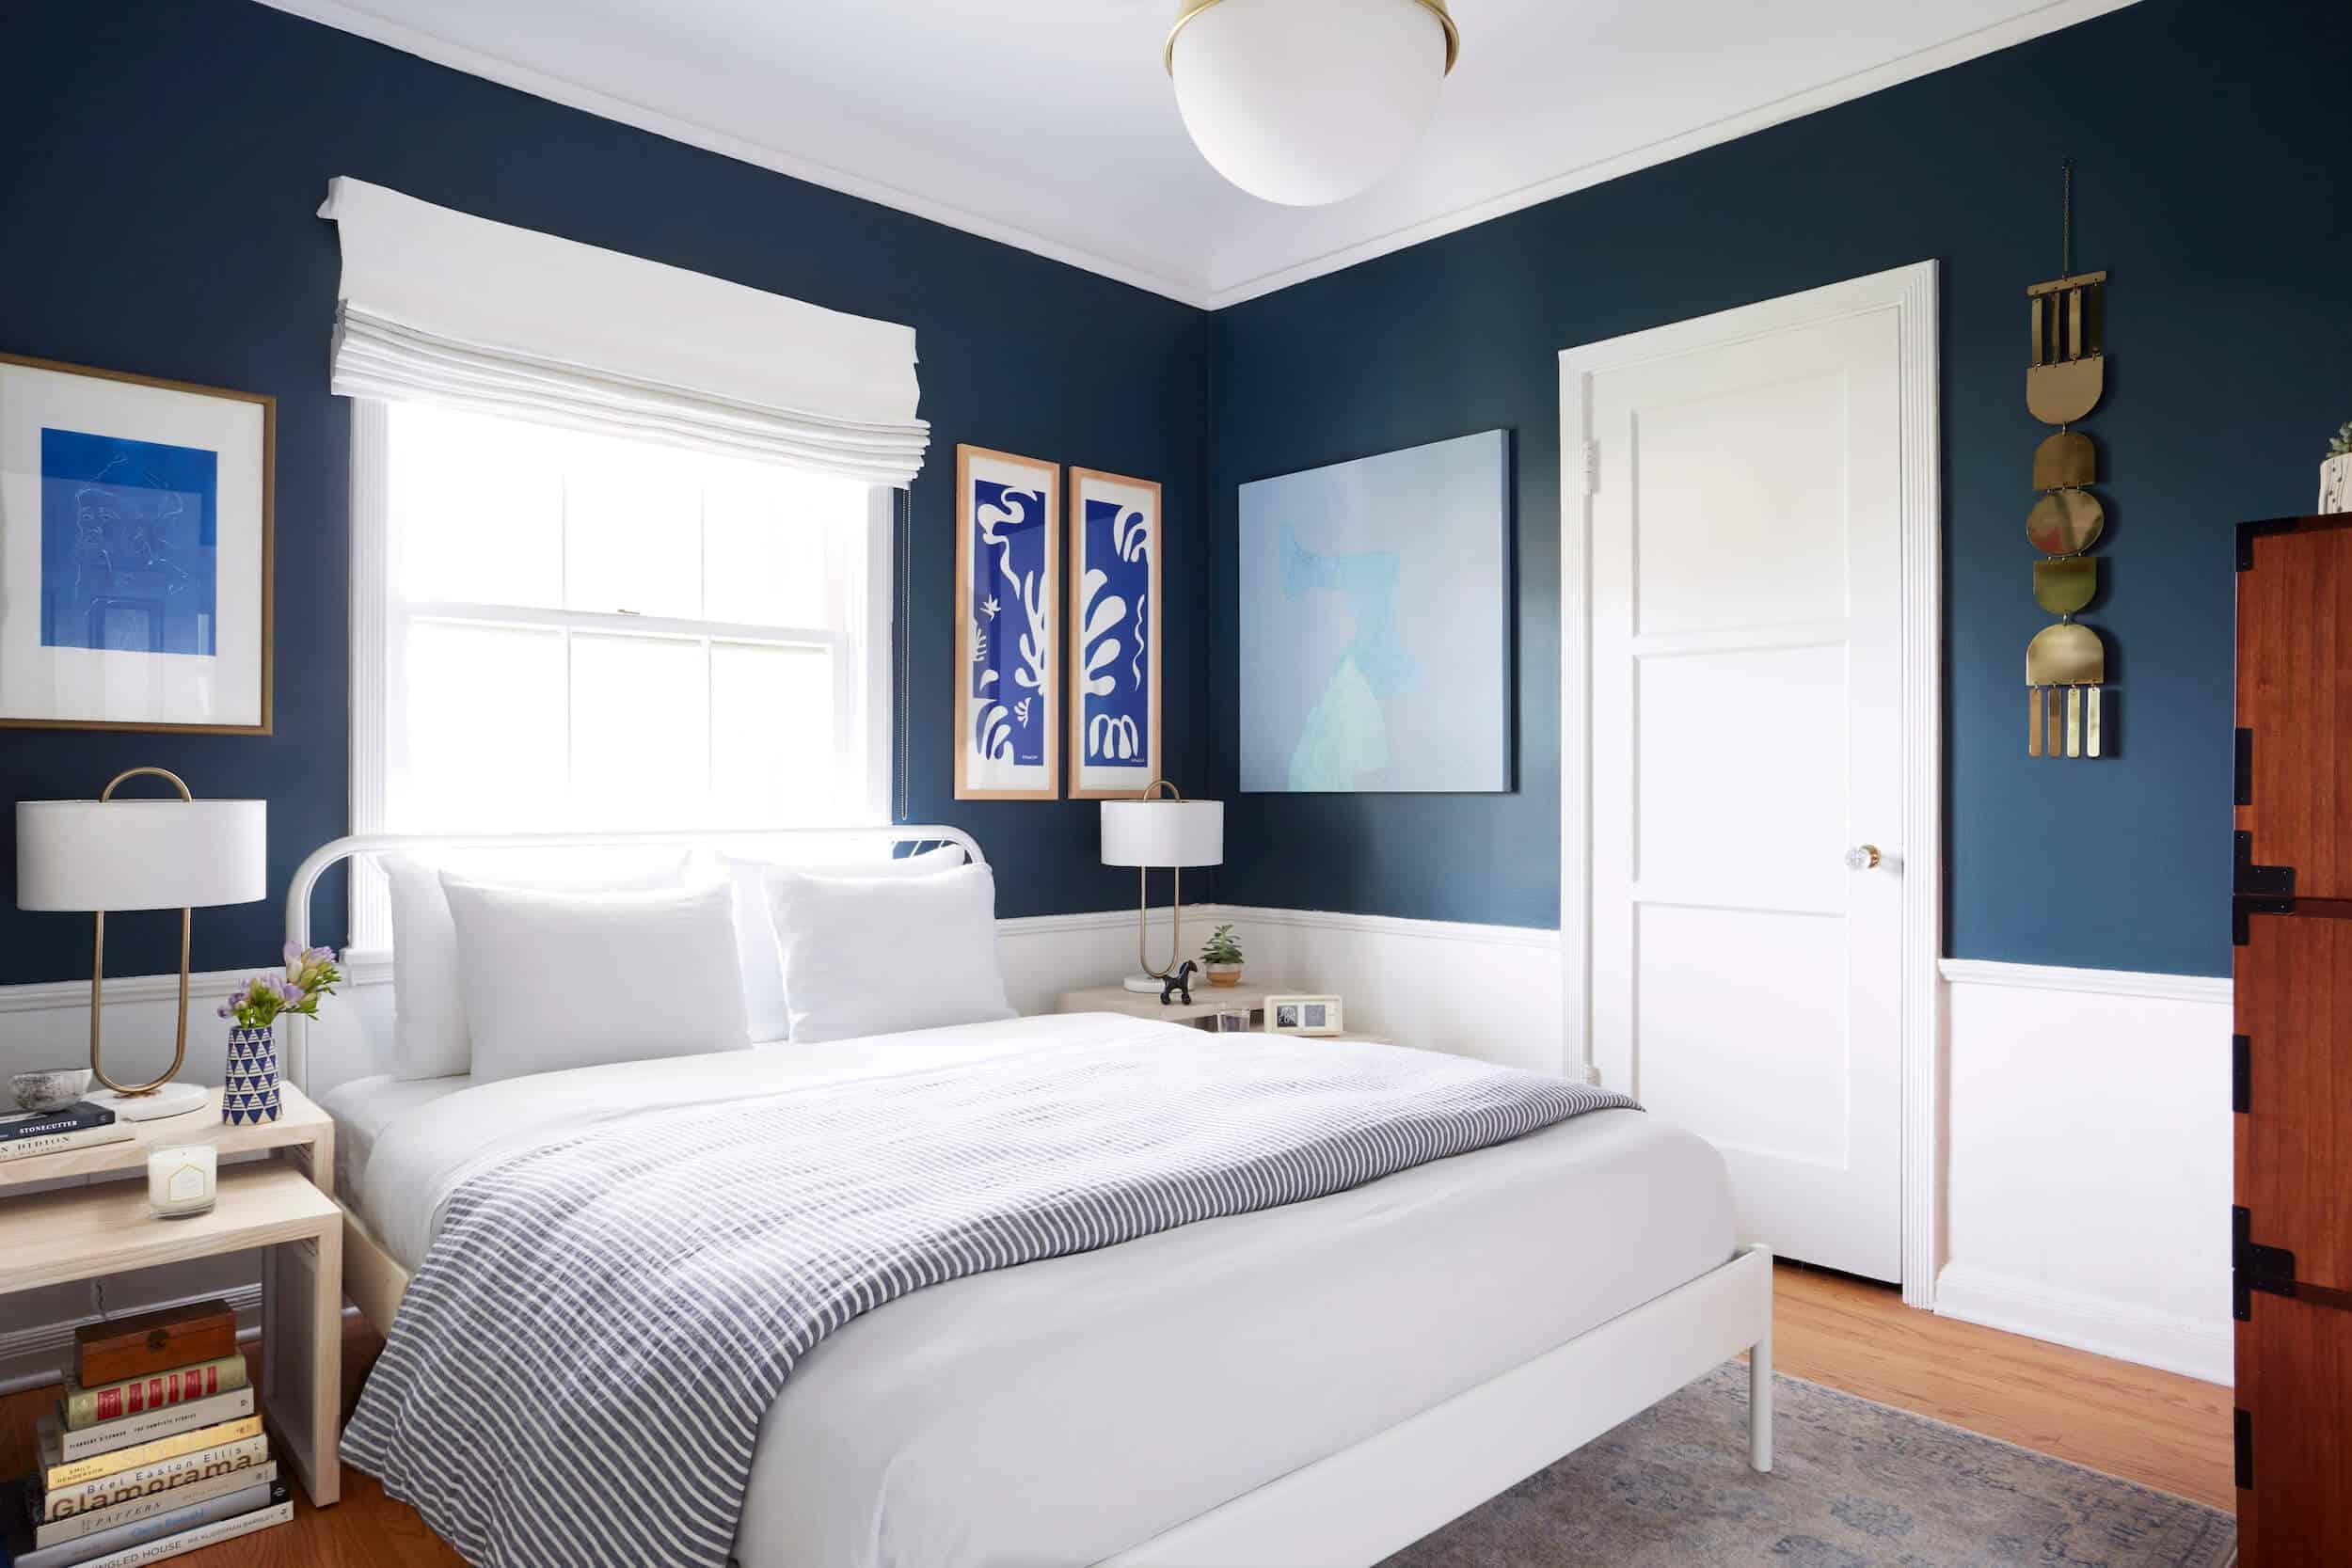 orlando-guest-room-reveal-3